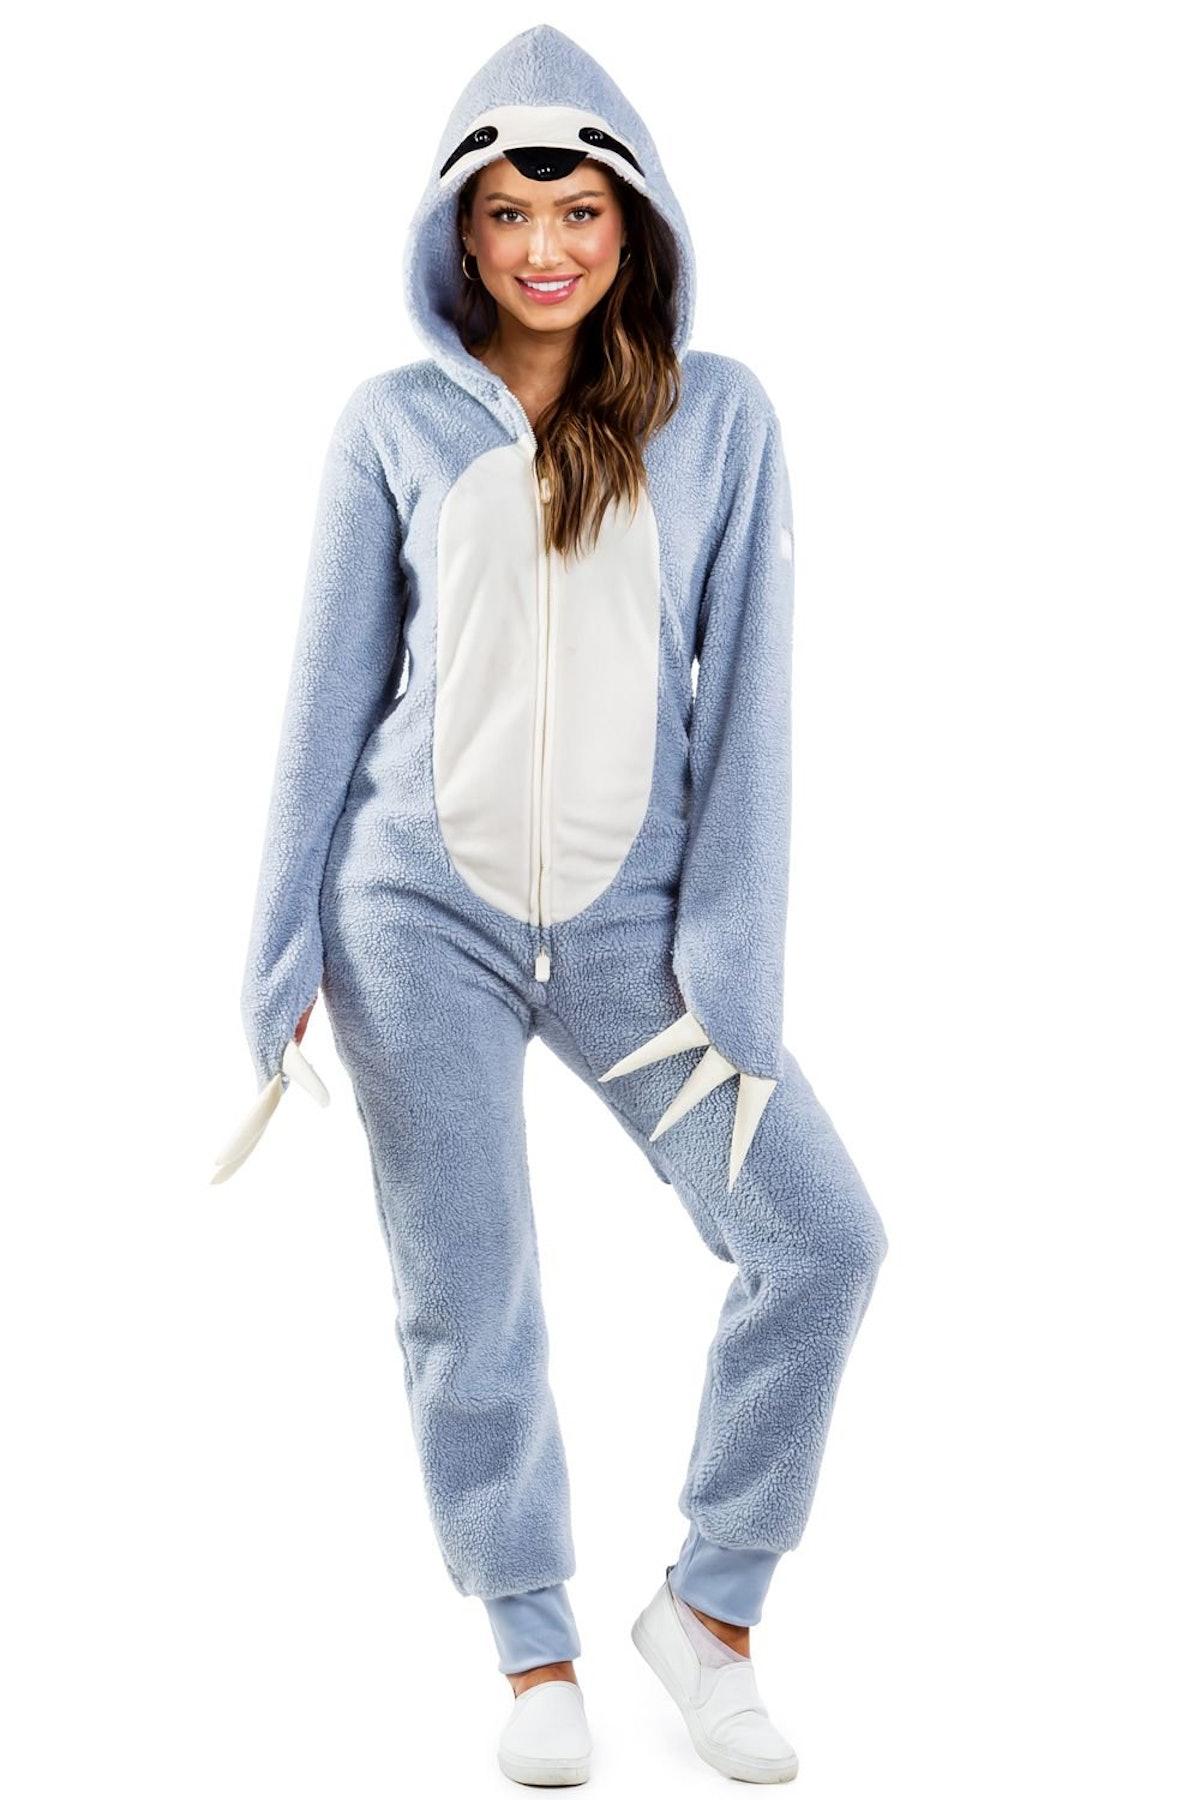 Women's Sloth Costume